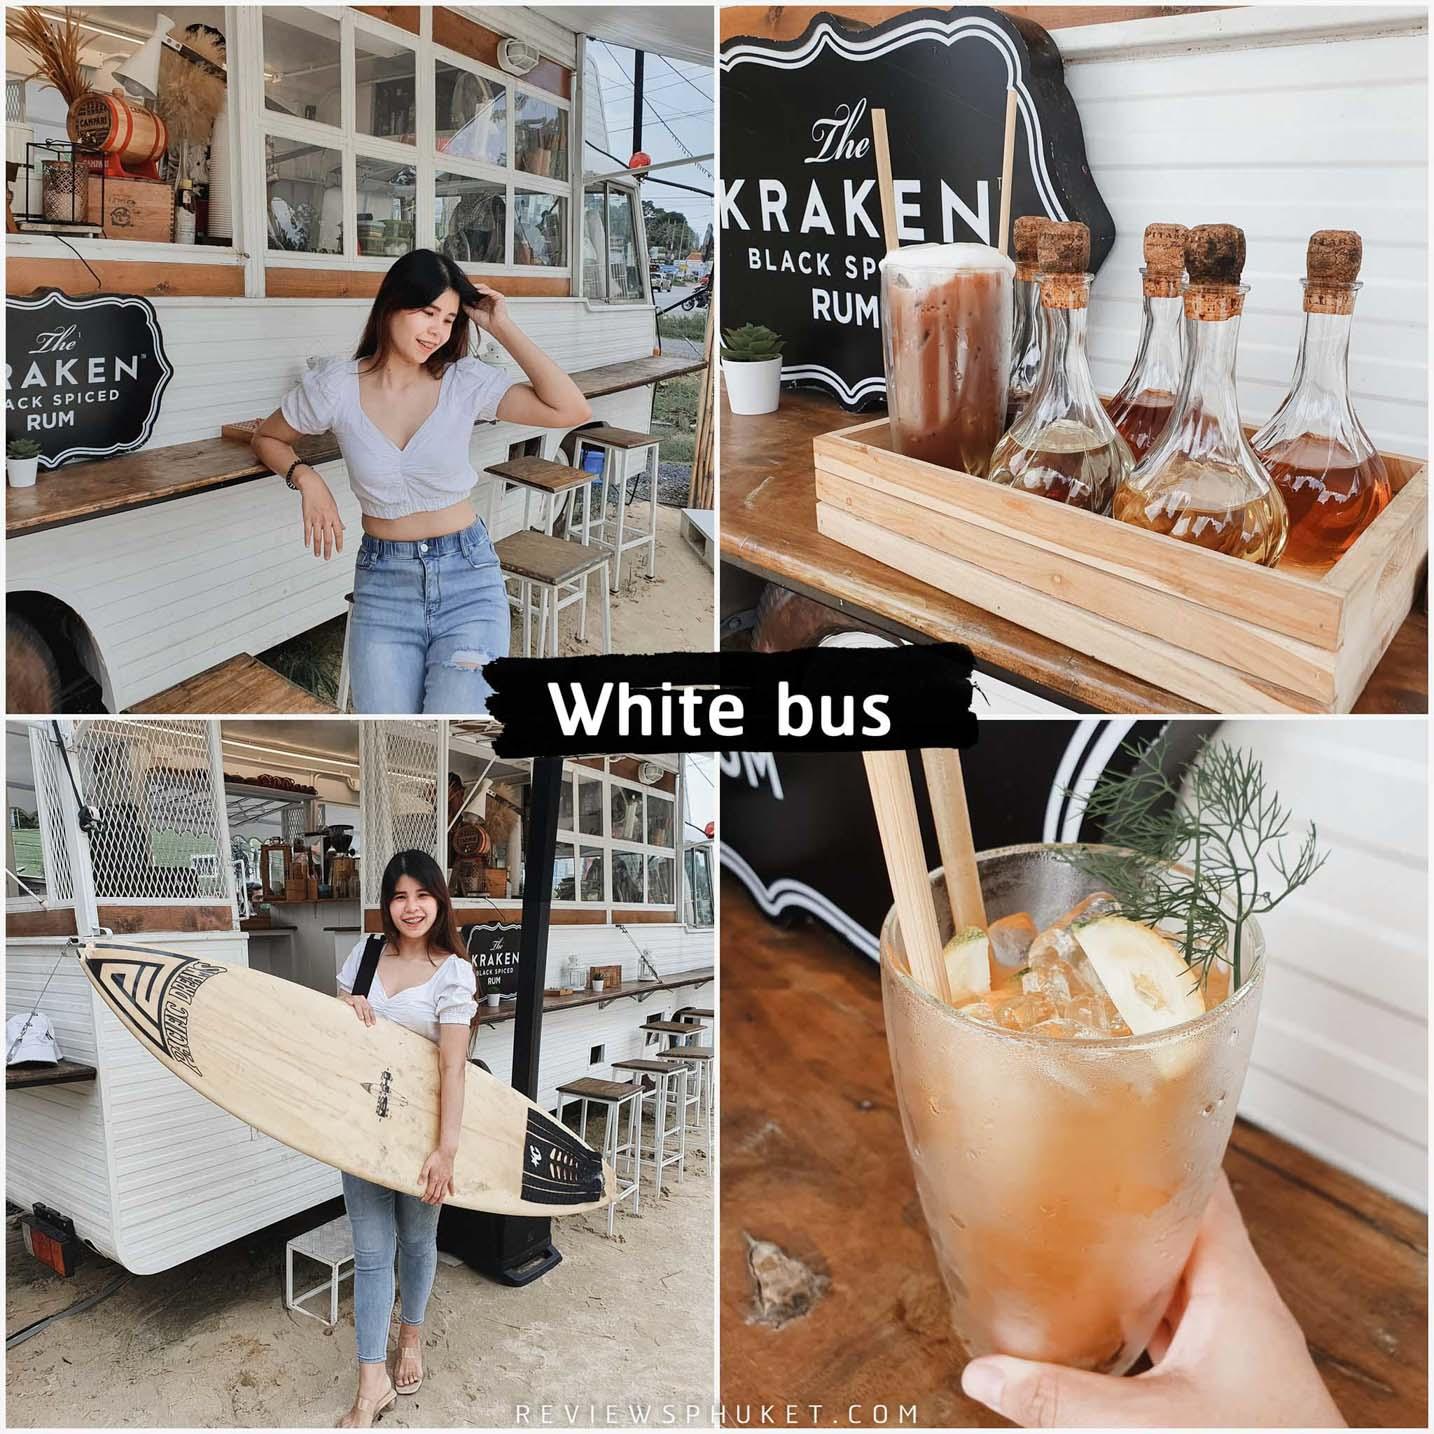 White Bus Speakeasy Bar คาเฟ่รถบัสสุดสวยมีความคิดสร้างสรรค์ ร้านมีหลายสไตล์ให้เลือกนั่งปักหมุดเช็คอินกัน